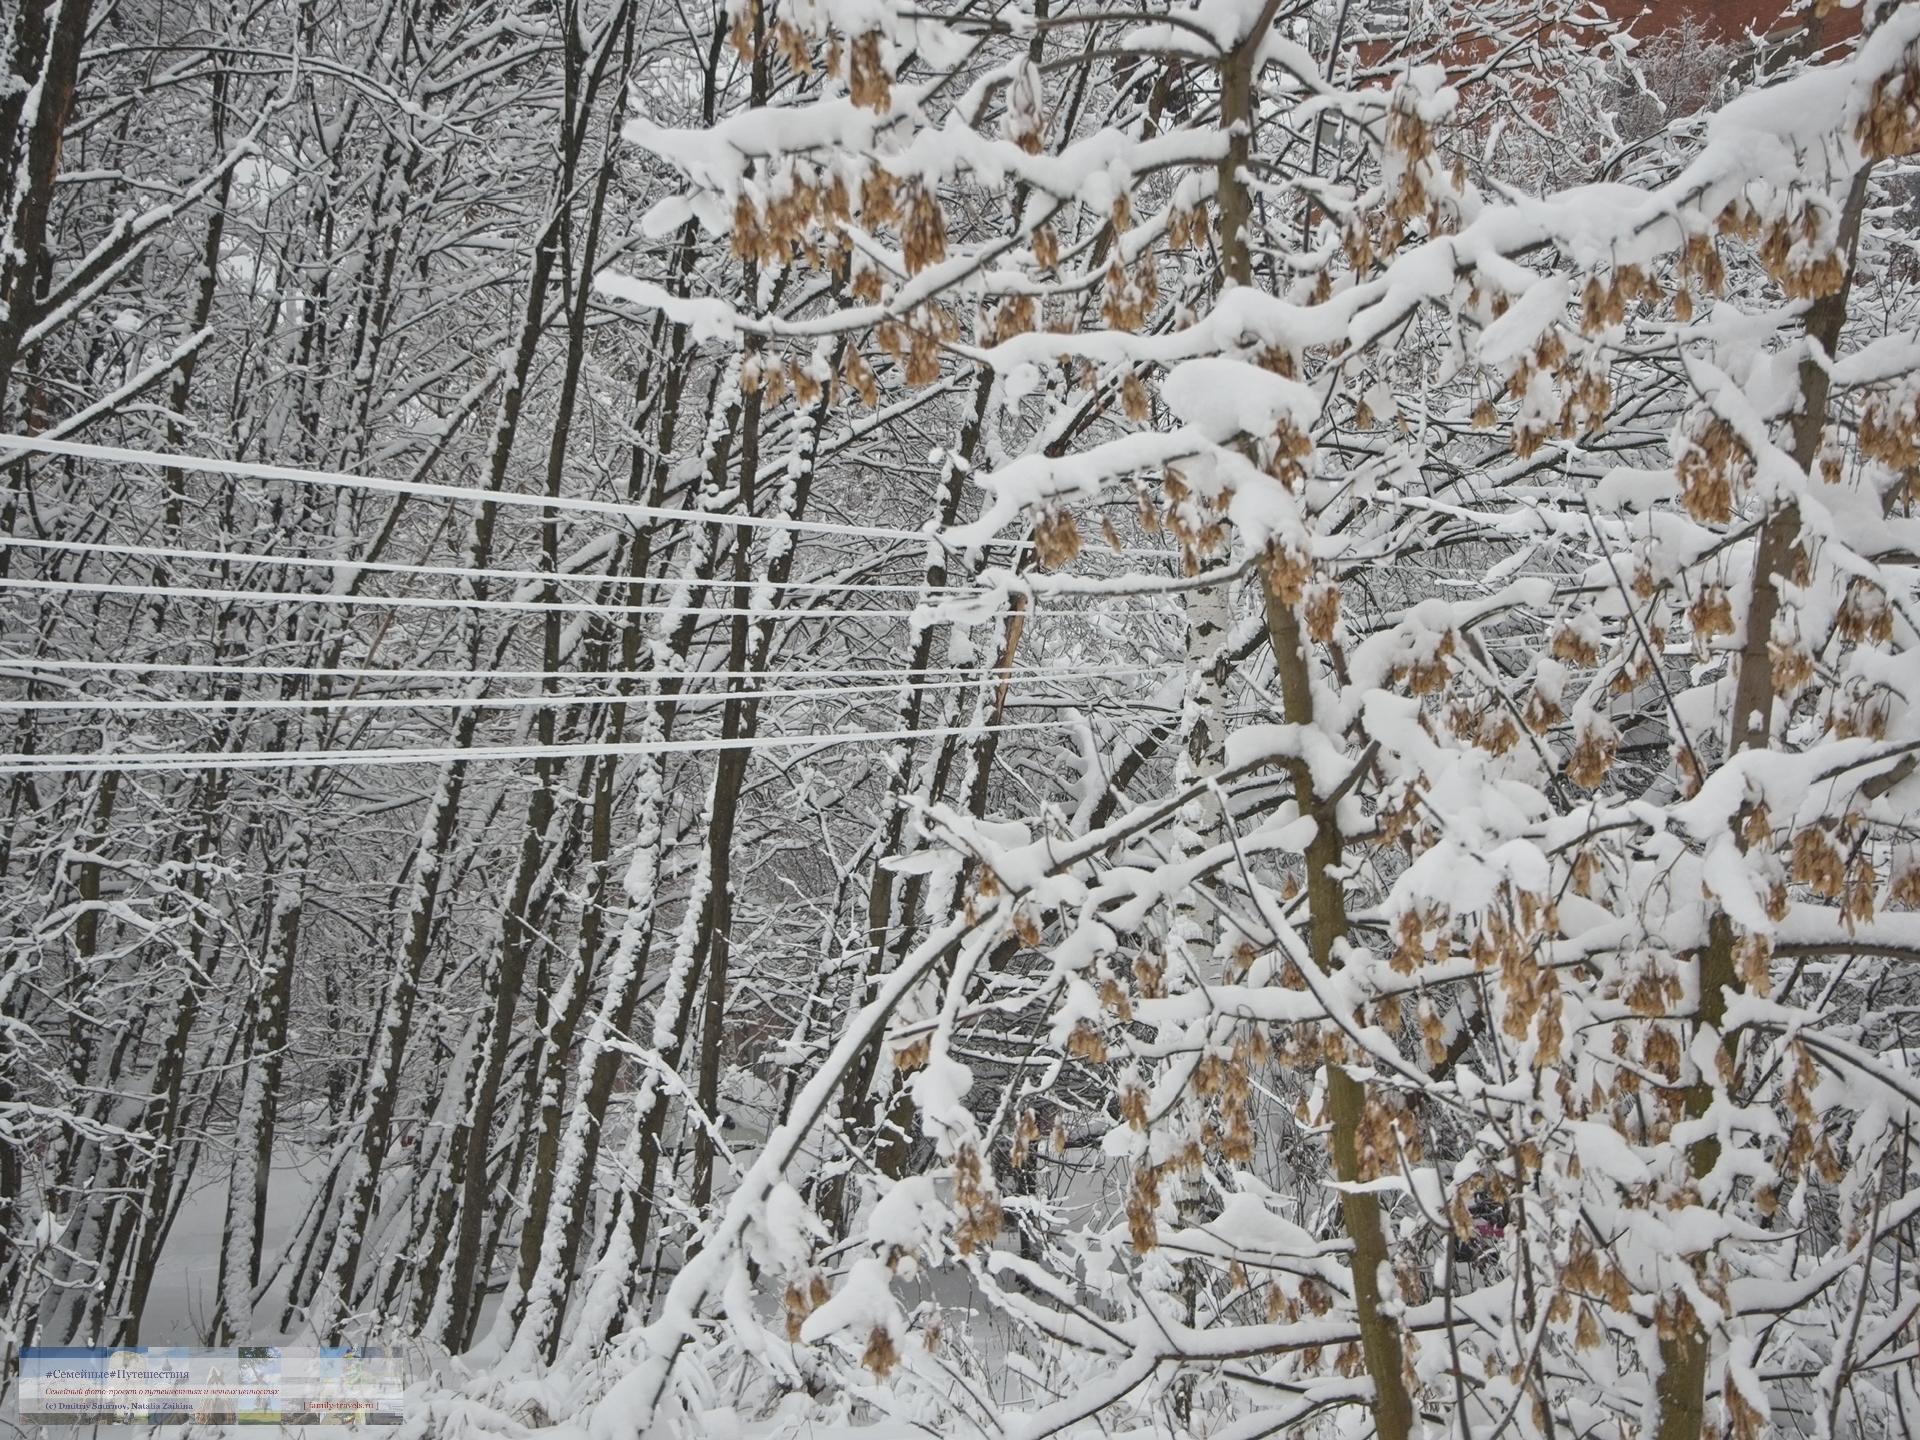 02042018-1517-Blog-040 Просто фото  Снегопад года